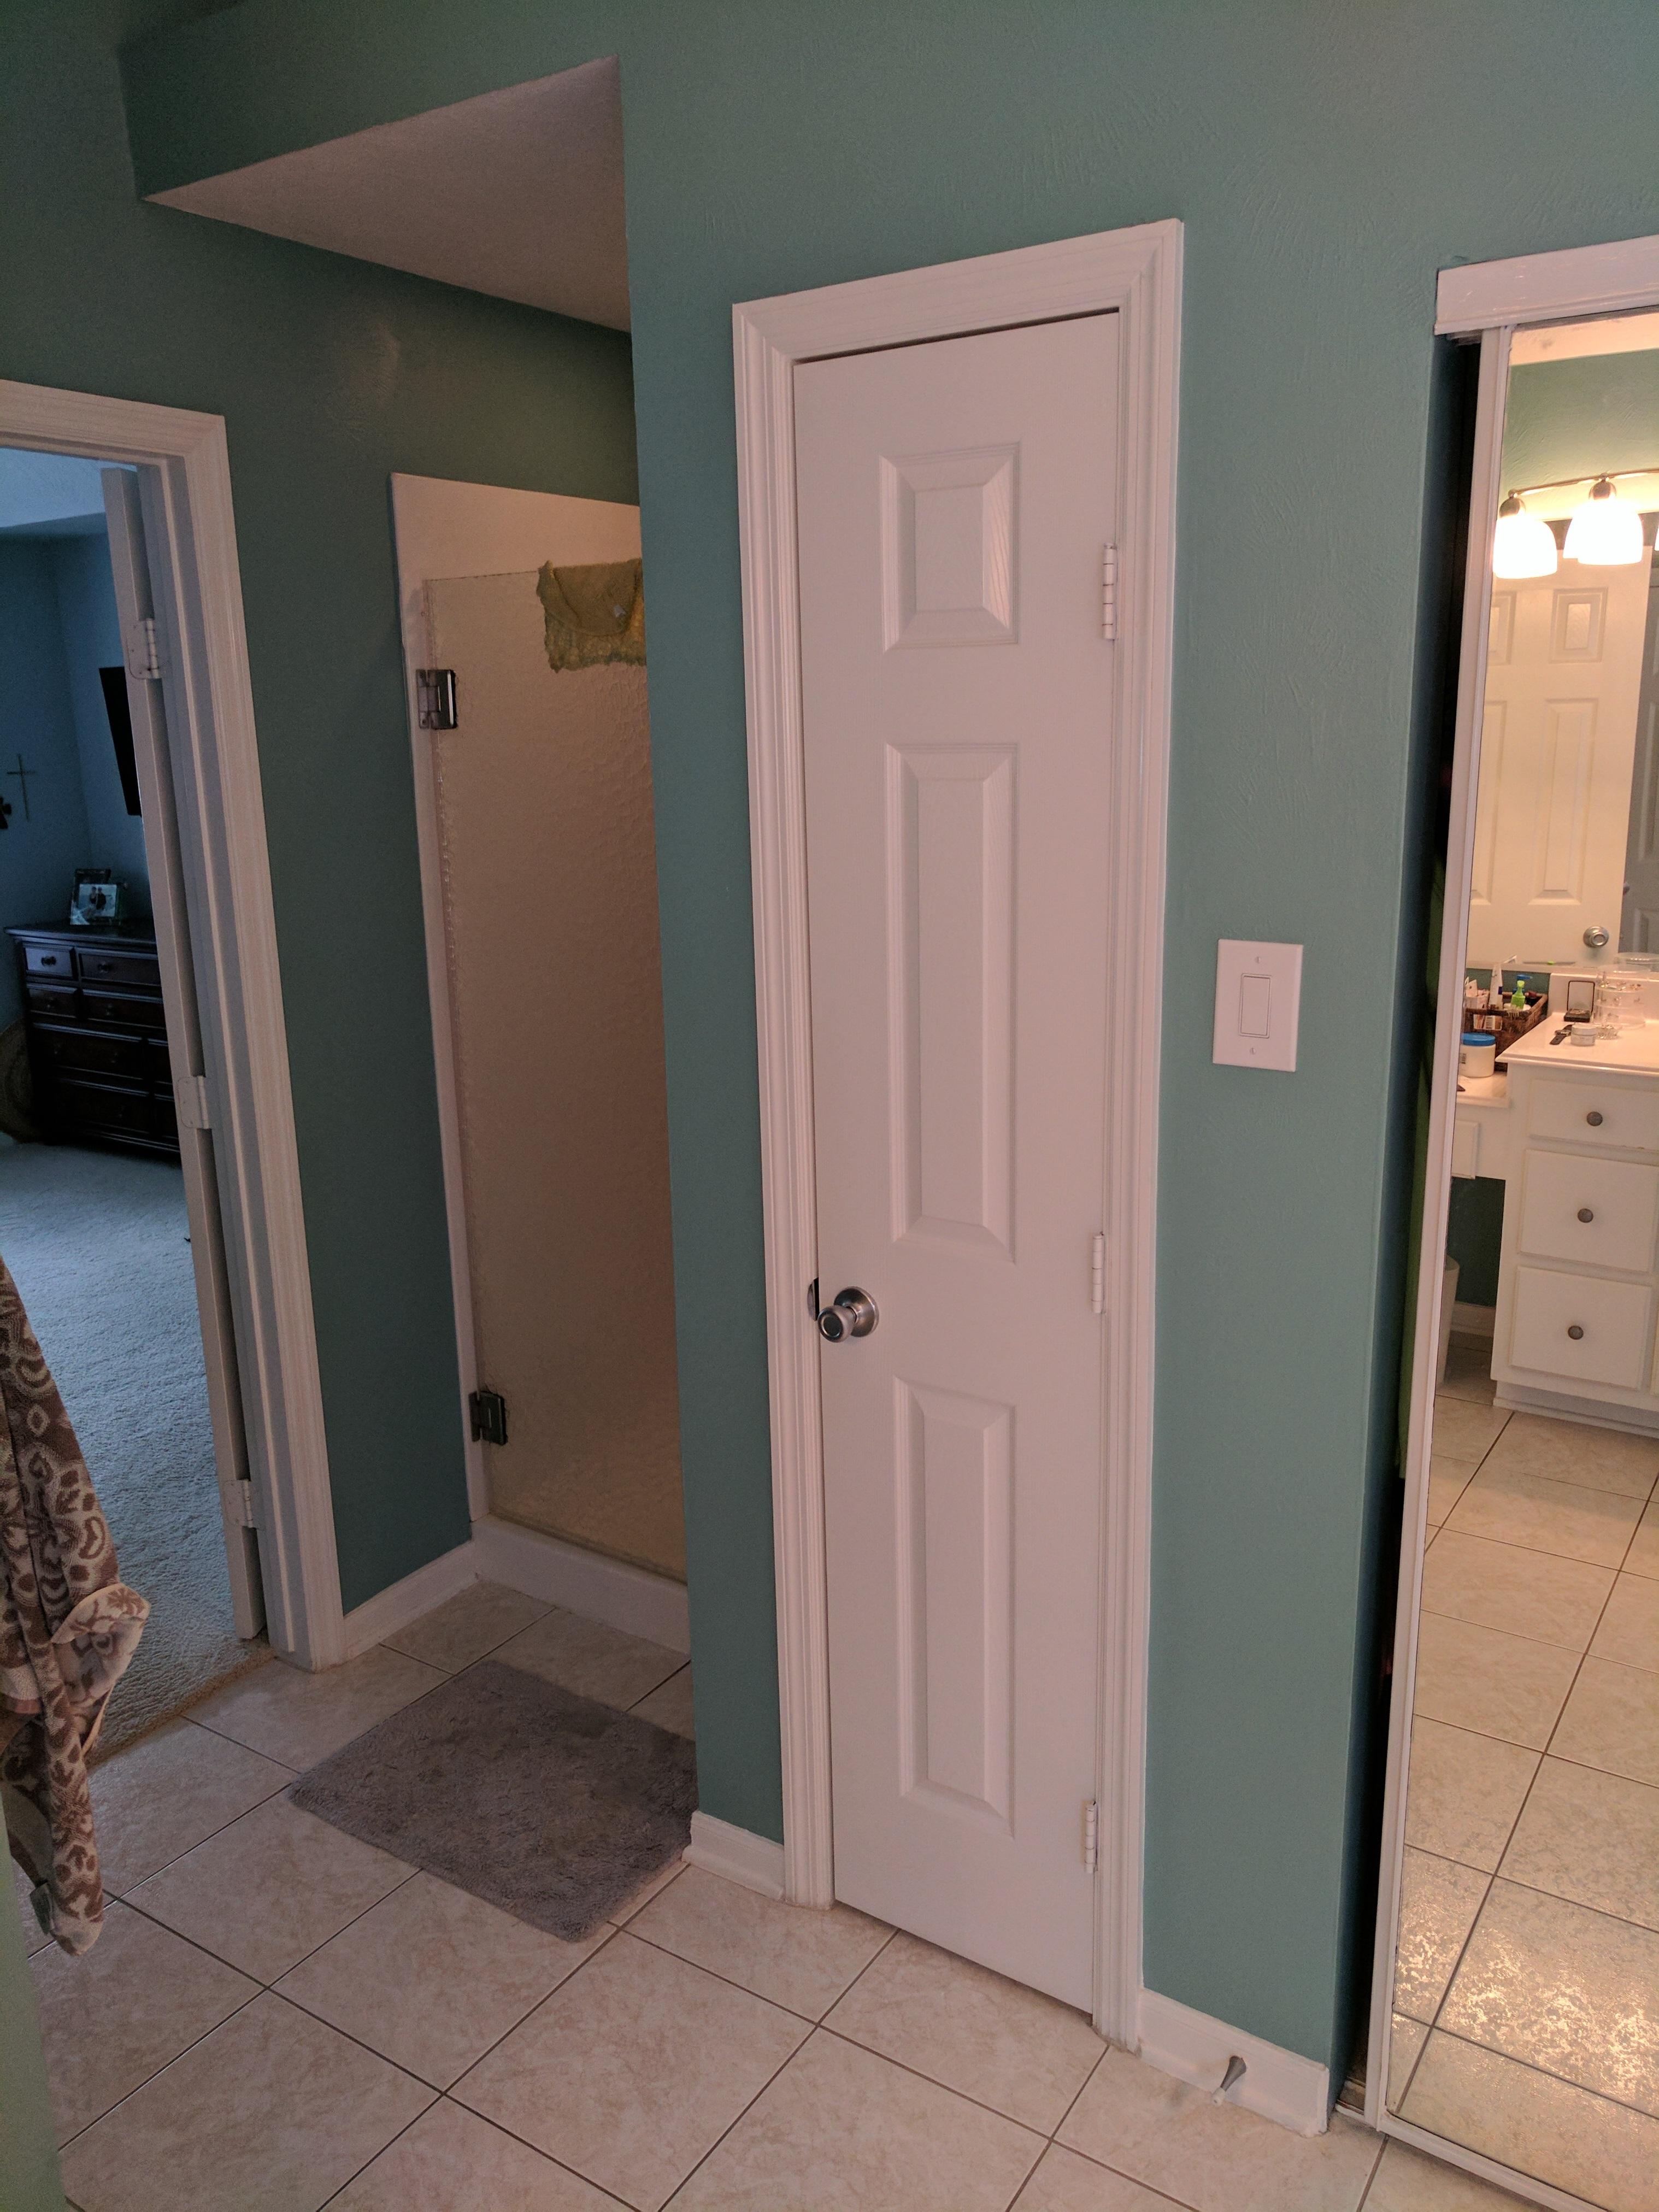 Picture of Upgrade Small Linen Closet in Bathroom to Include Hamper